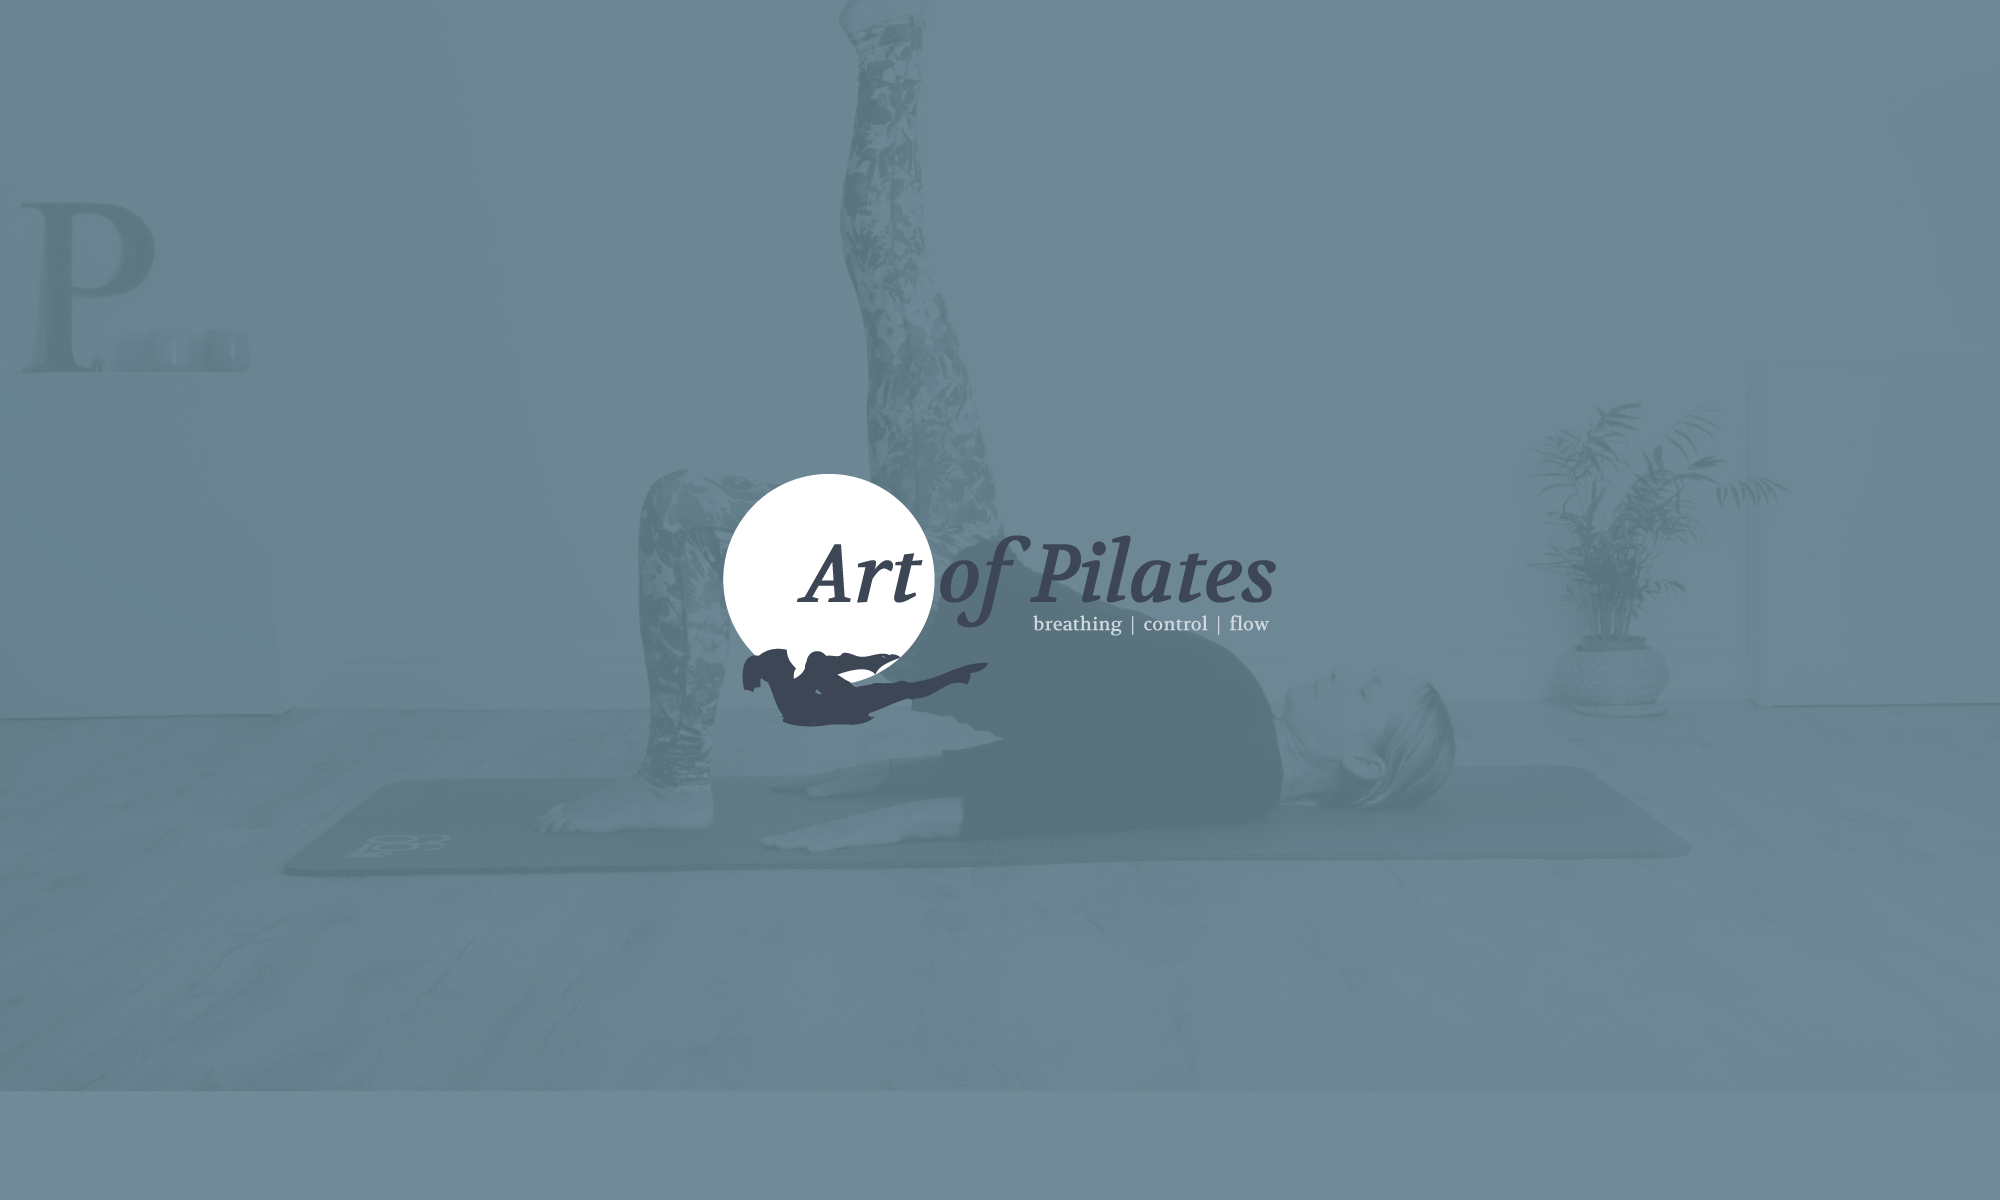 Art of Pilates